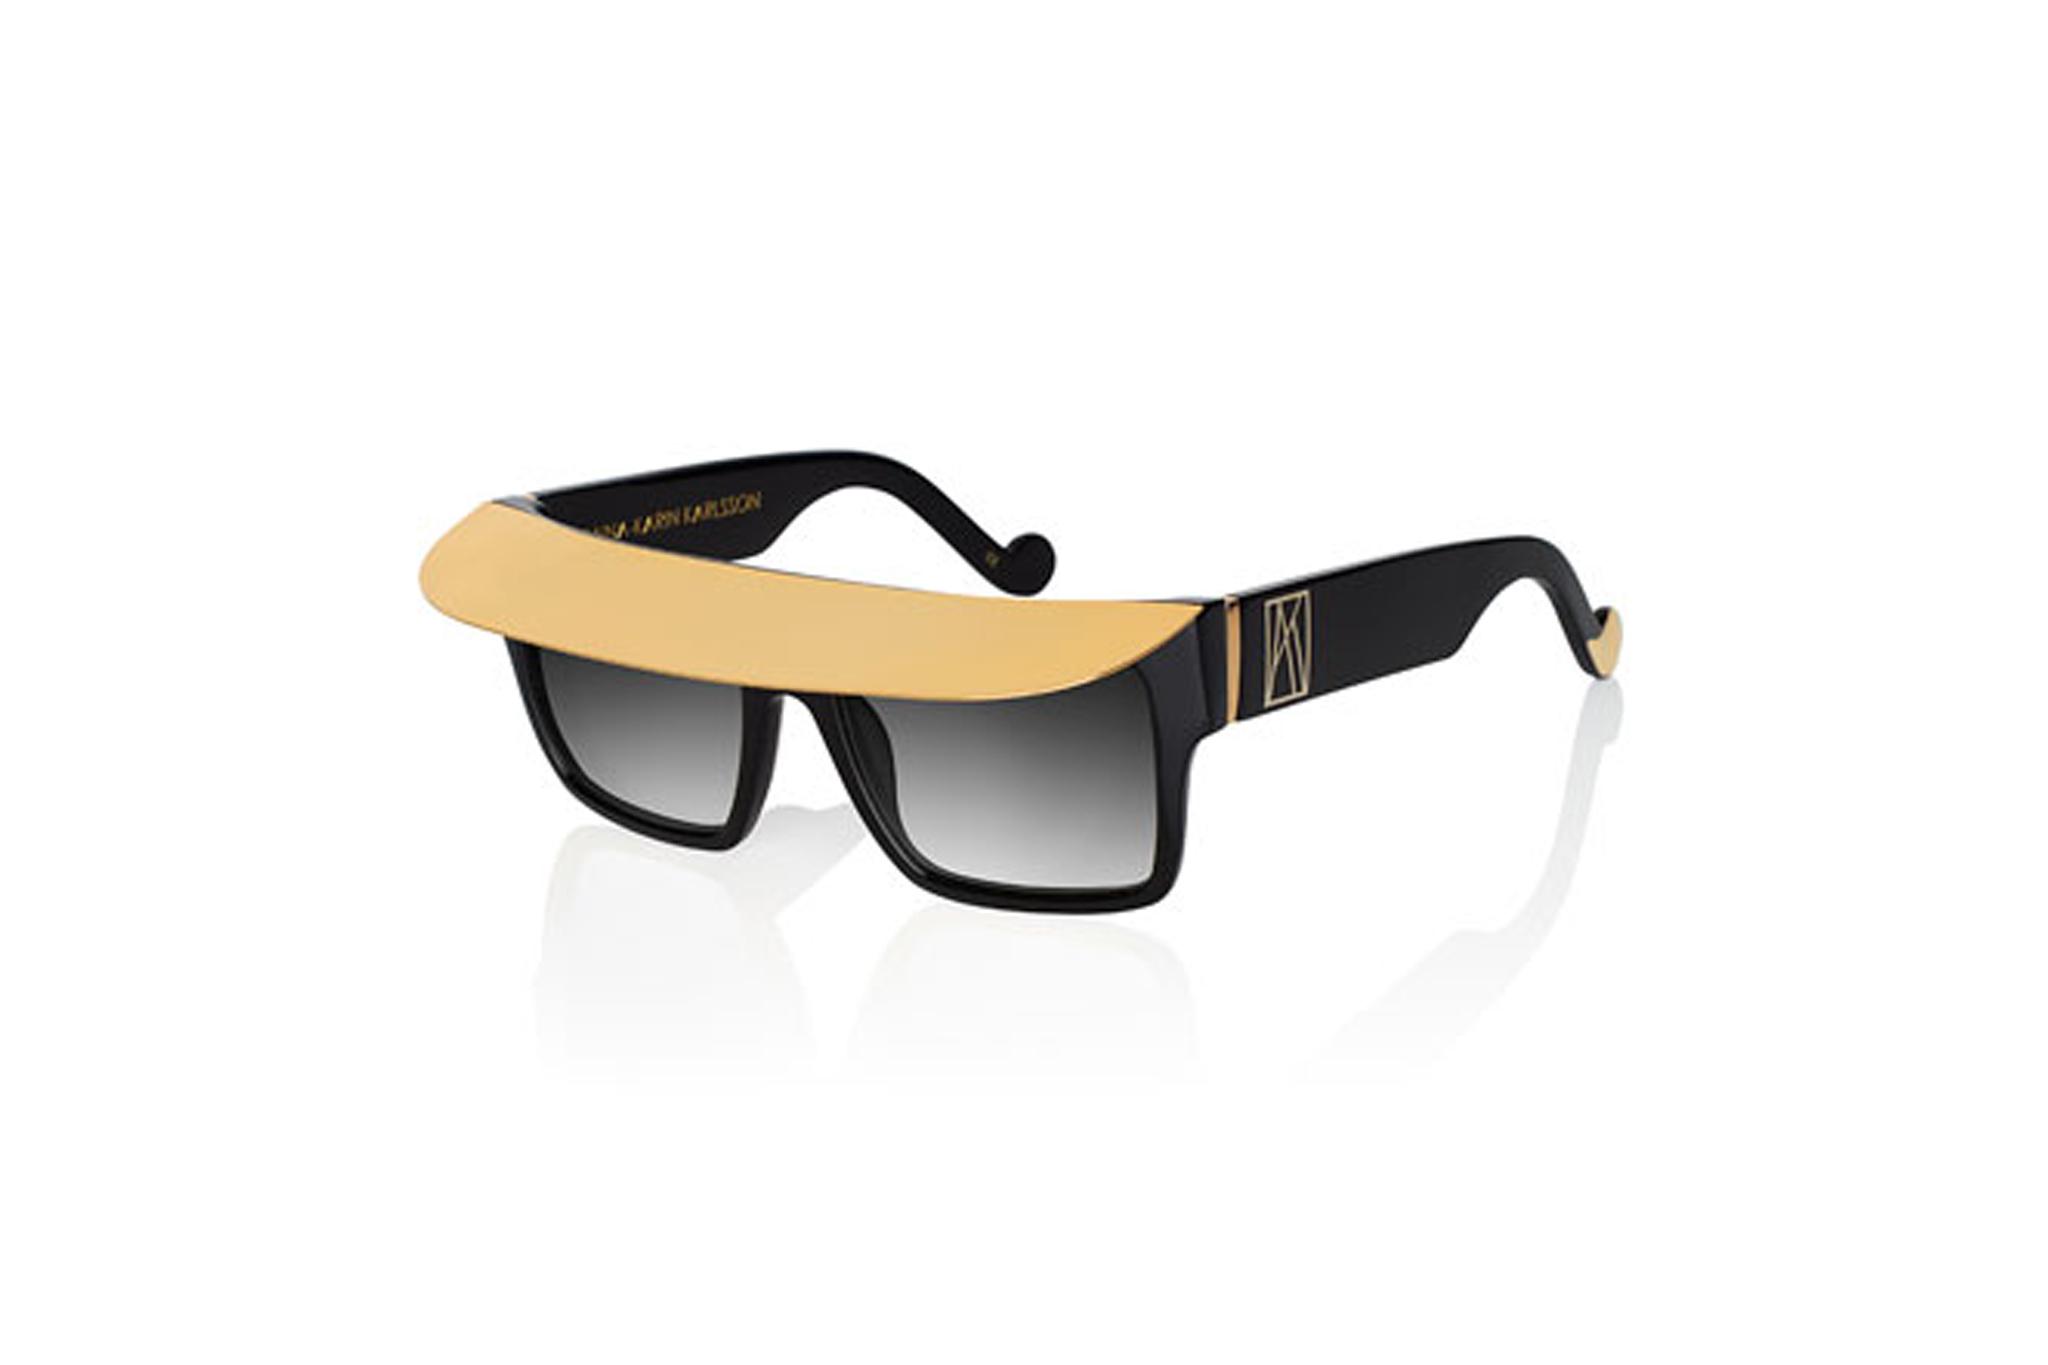 Anna-Karin KarlssonShady Metal-Brow Square Sunglasses